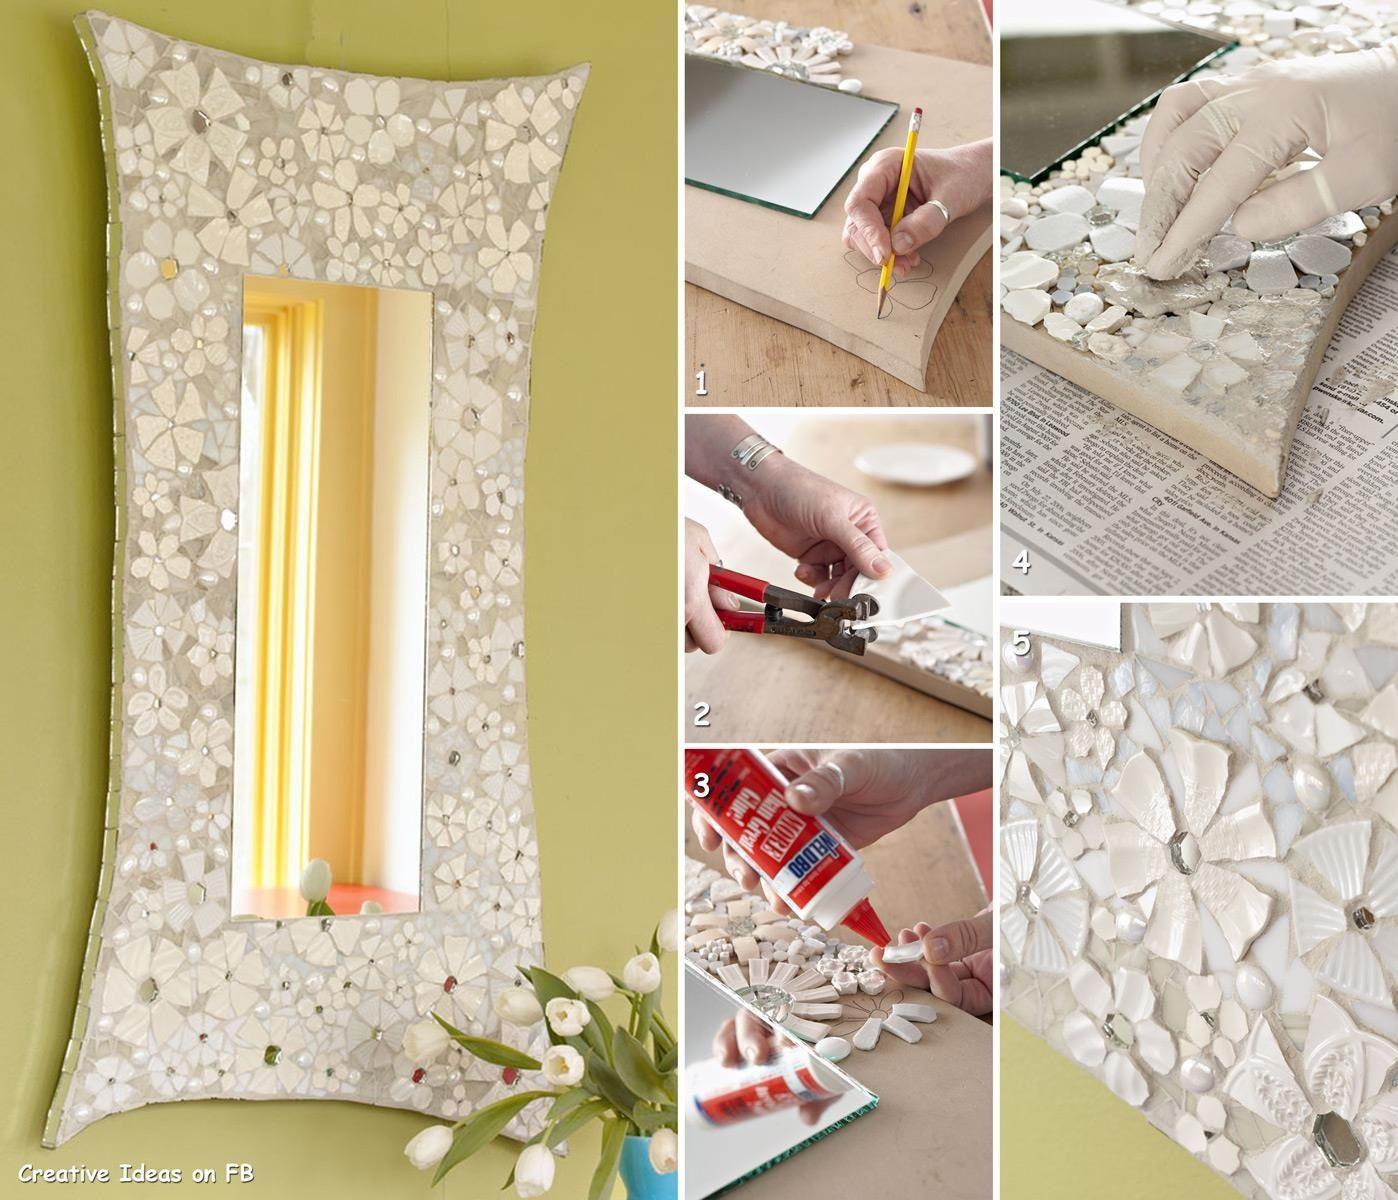 Lindo espejo   Crafts diy   Pinterest   Craft